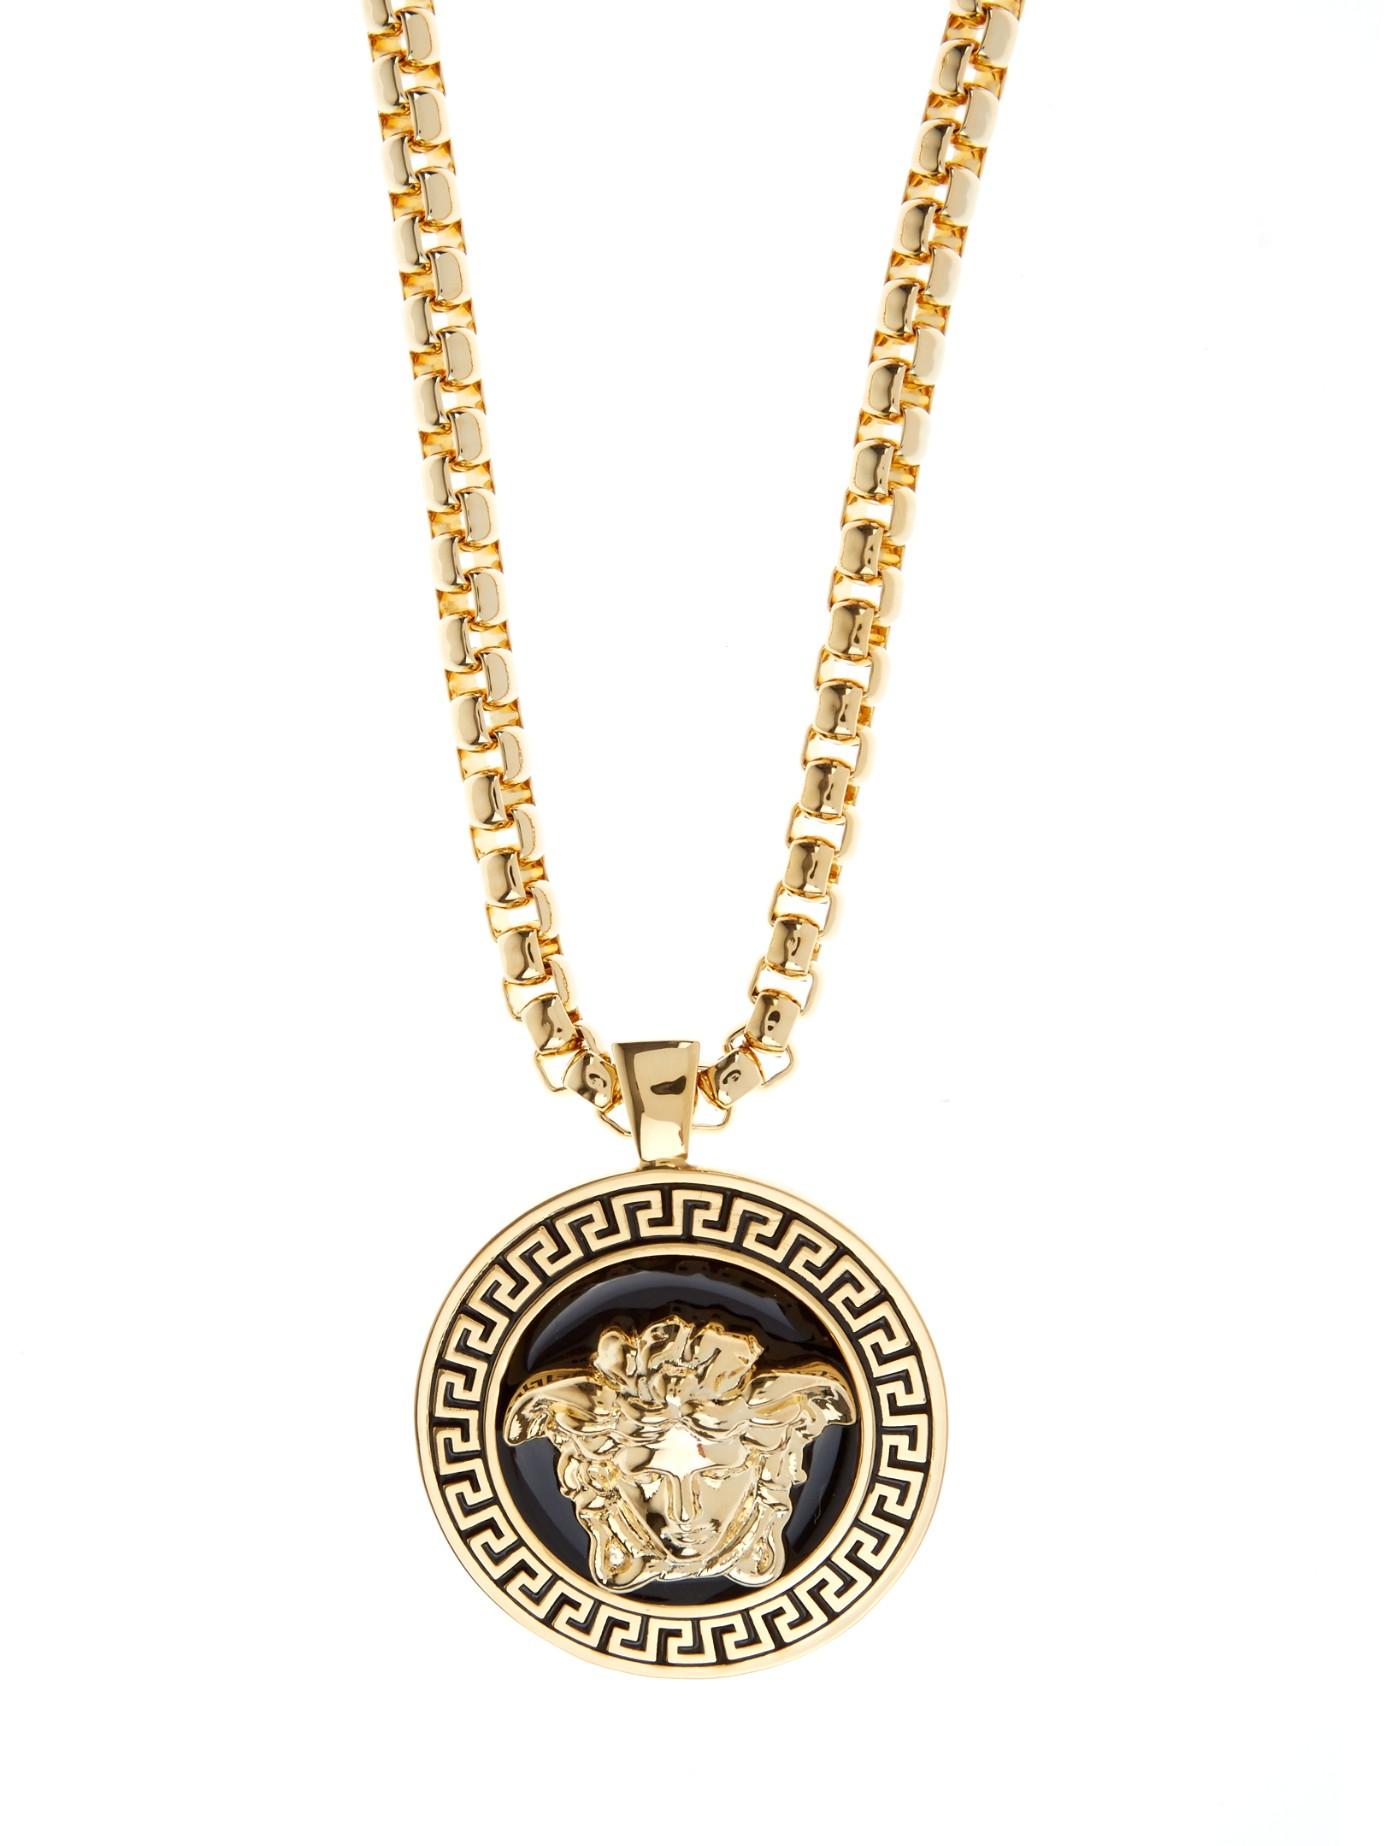 e5a9e55f2f2e9b Versace Mens Pendant Design Ideas. Versace Silver Medusa Pendant Necklace  ...